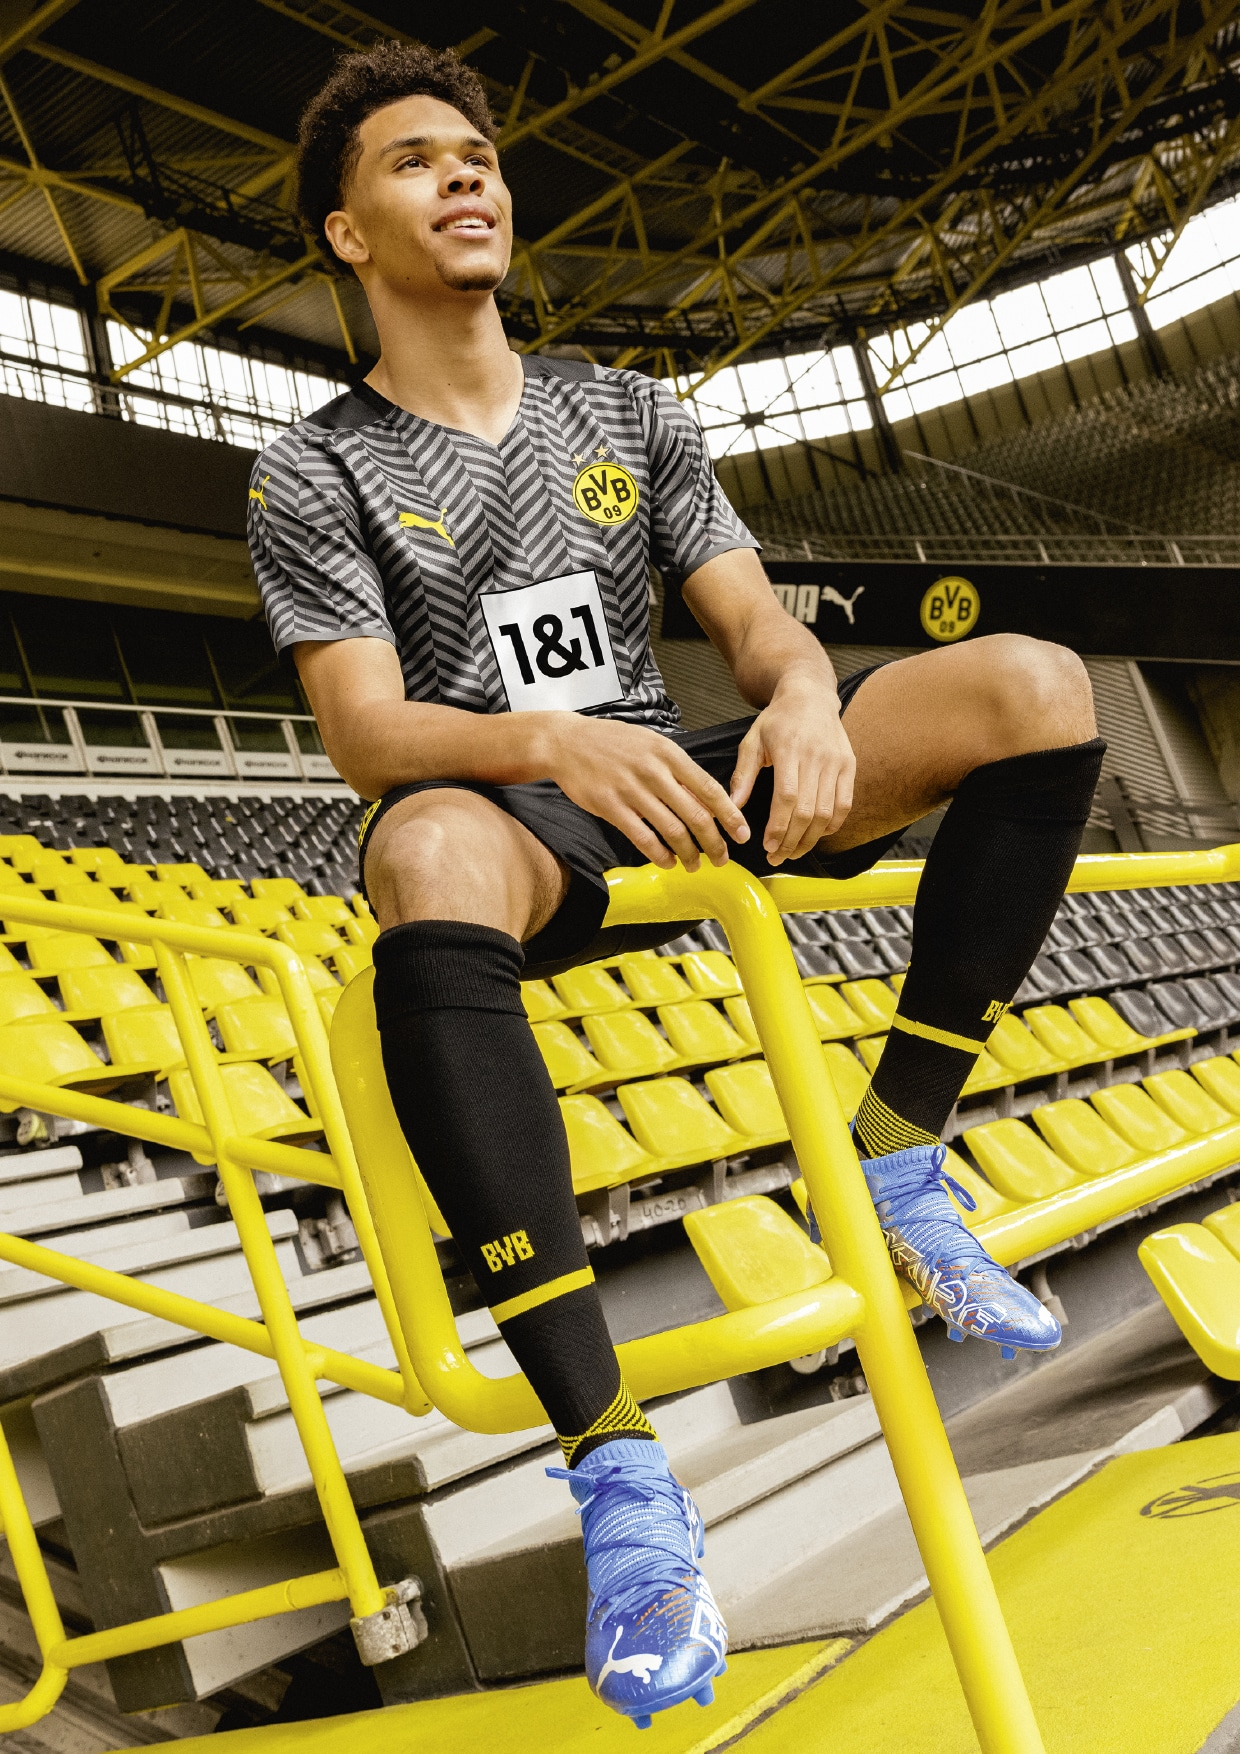 Maillot Borussia Dortmund exterieur 2021/22 PUMA